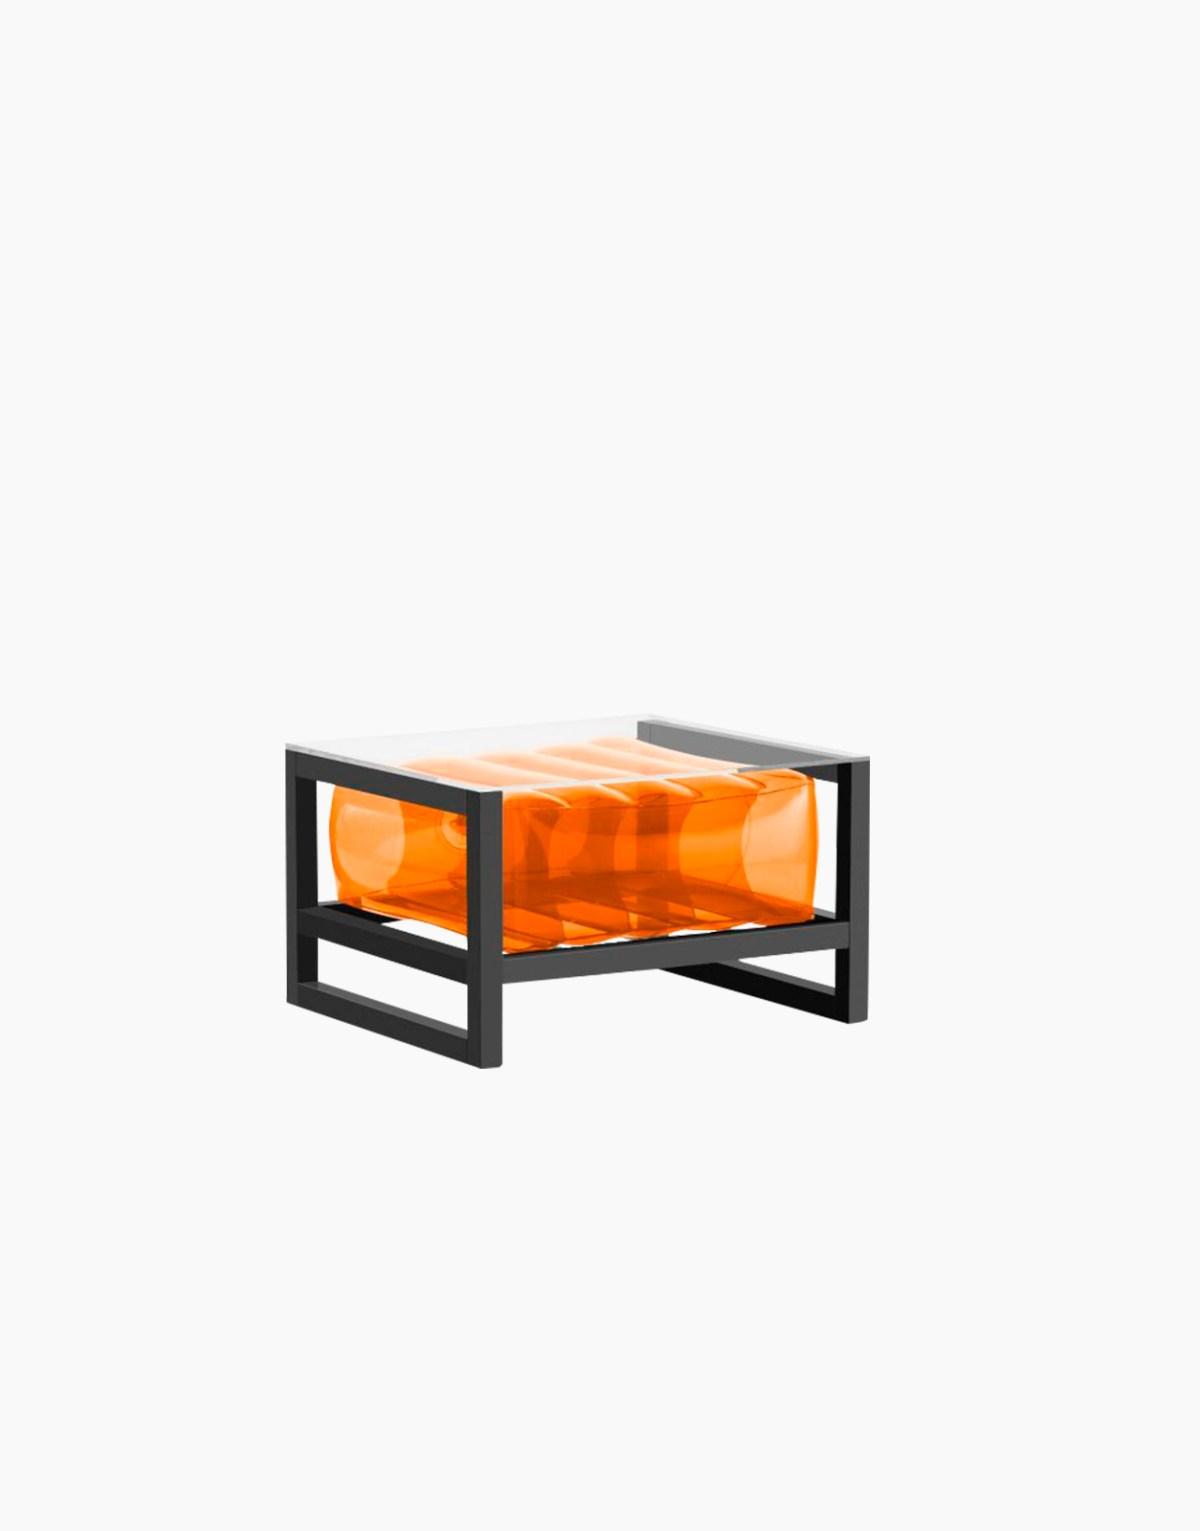 Revendeur de Mojow solution design fr mobilier table basse Yoko blanc orange cristal